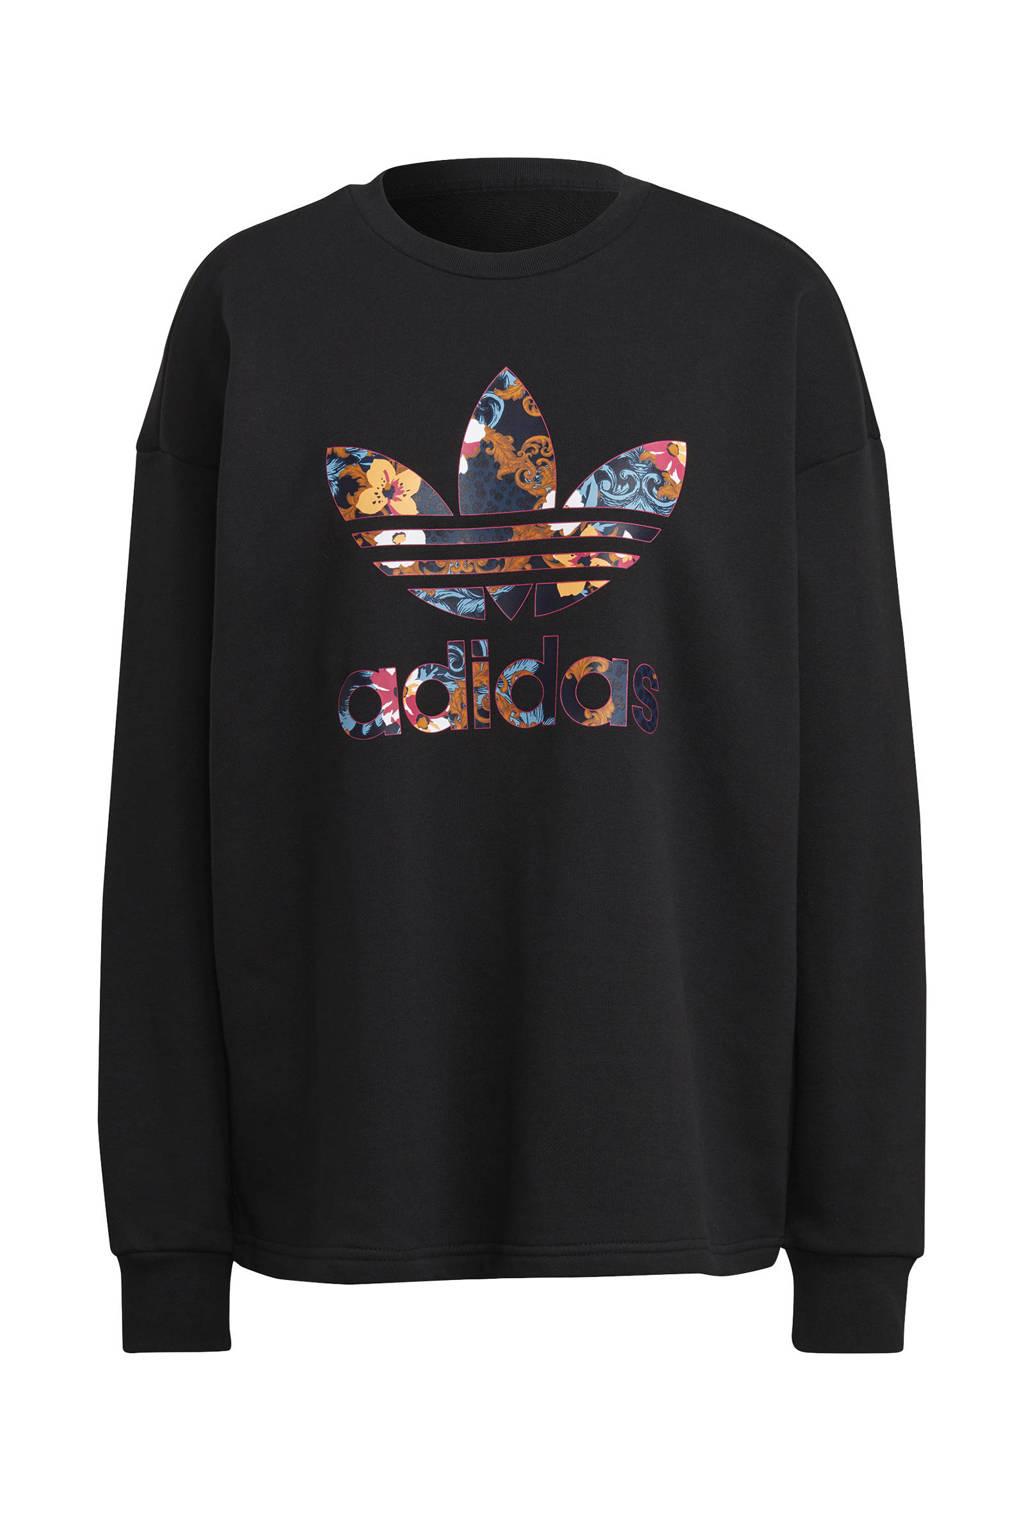 adidas Originals sweater zwart/multi, Zwart